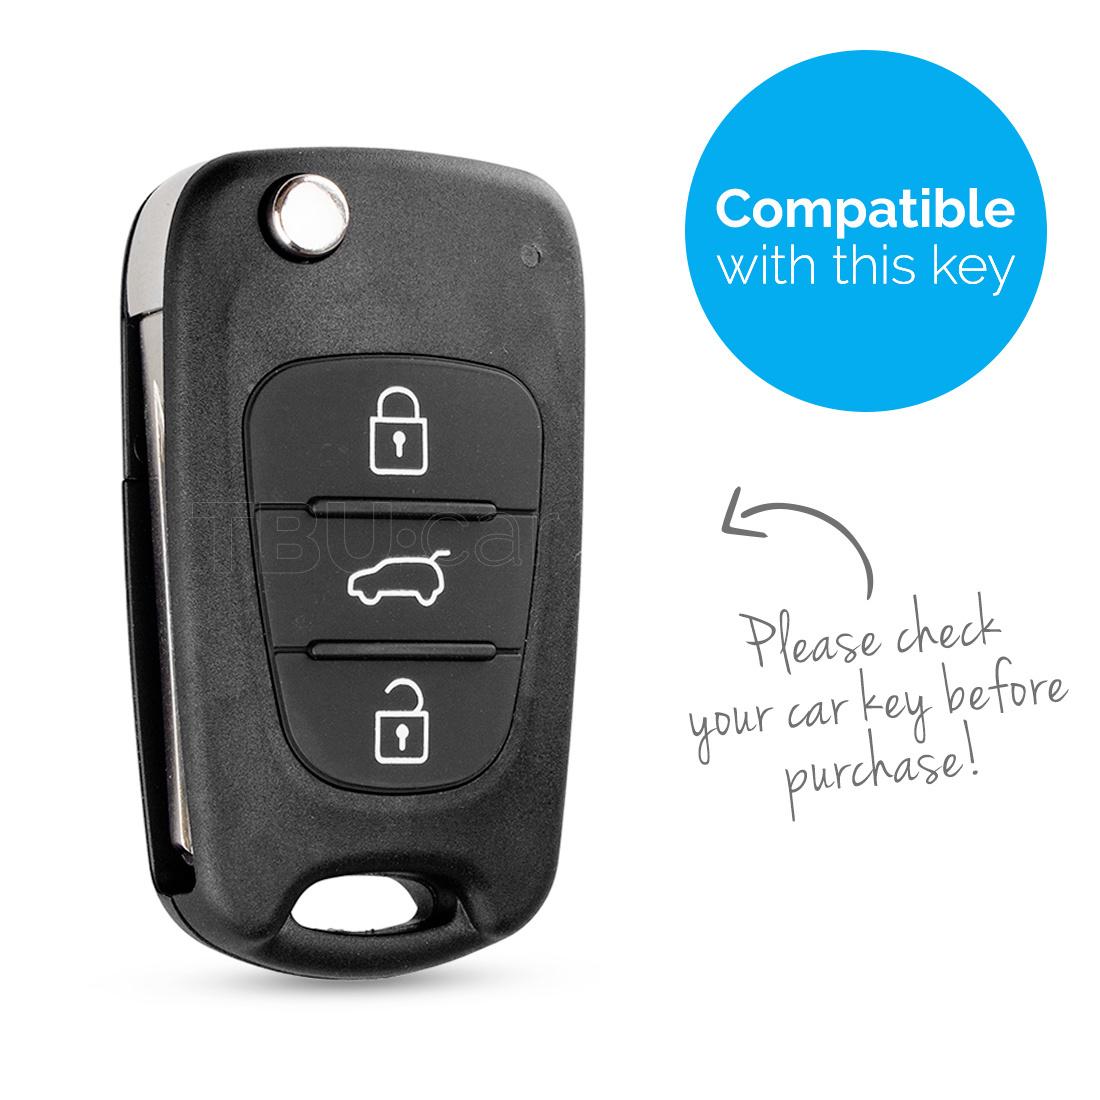 TBU car TBU car Sleutel cover compatibel met Hyundai - Silicone sleutelhoesje - beschermhoesje autosleutel - Wit